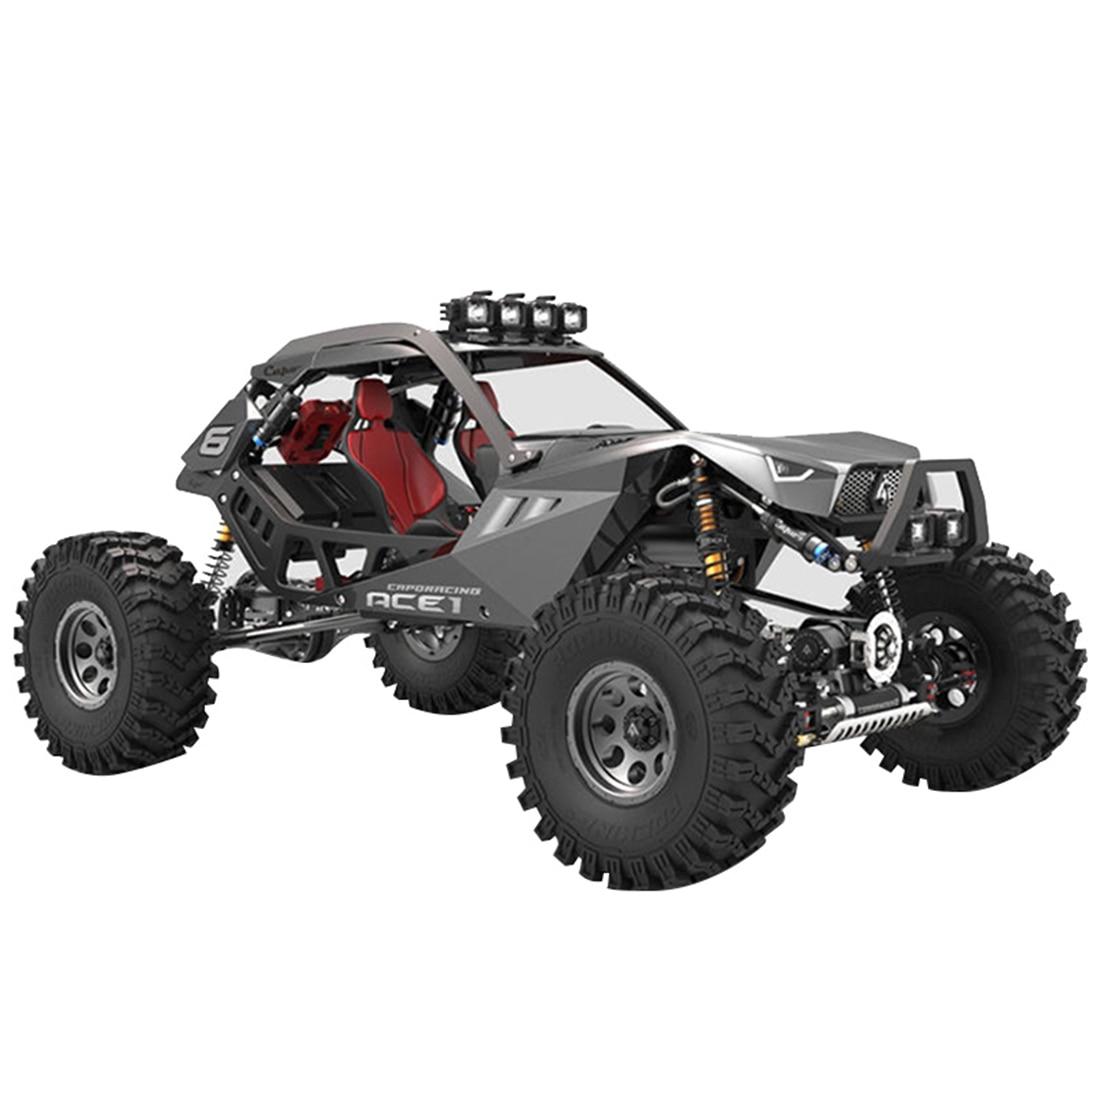 Assembly Capo ACE1 4X4 1:10 Simulated Rock Crawler Off-road Vehicle Model - KIT Bulk Version Model Building Kits